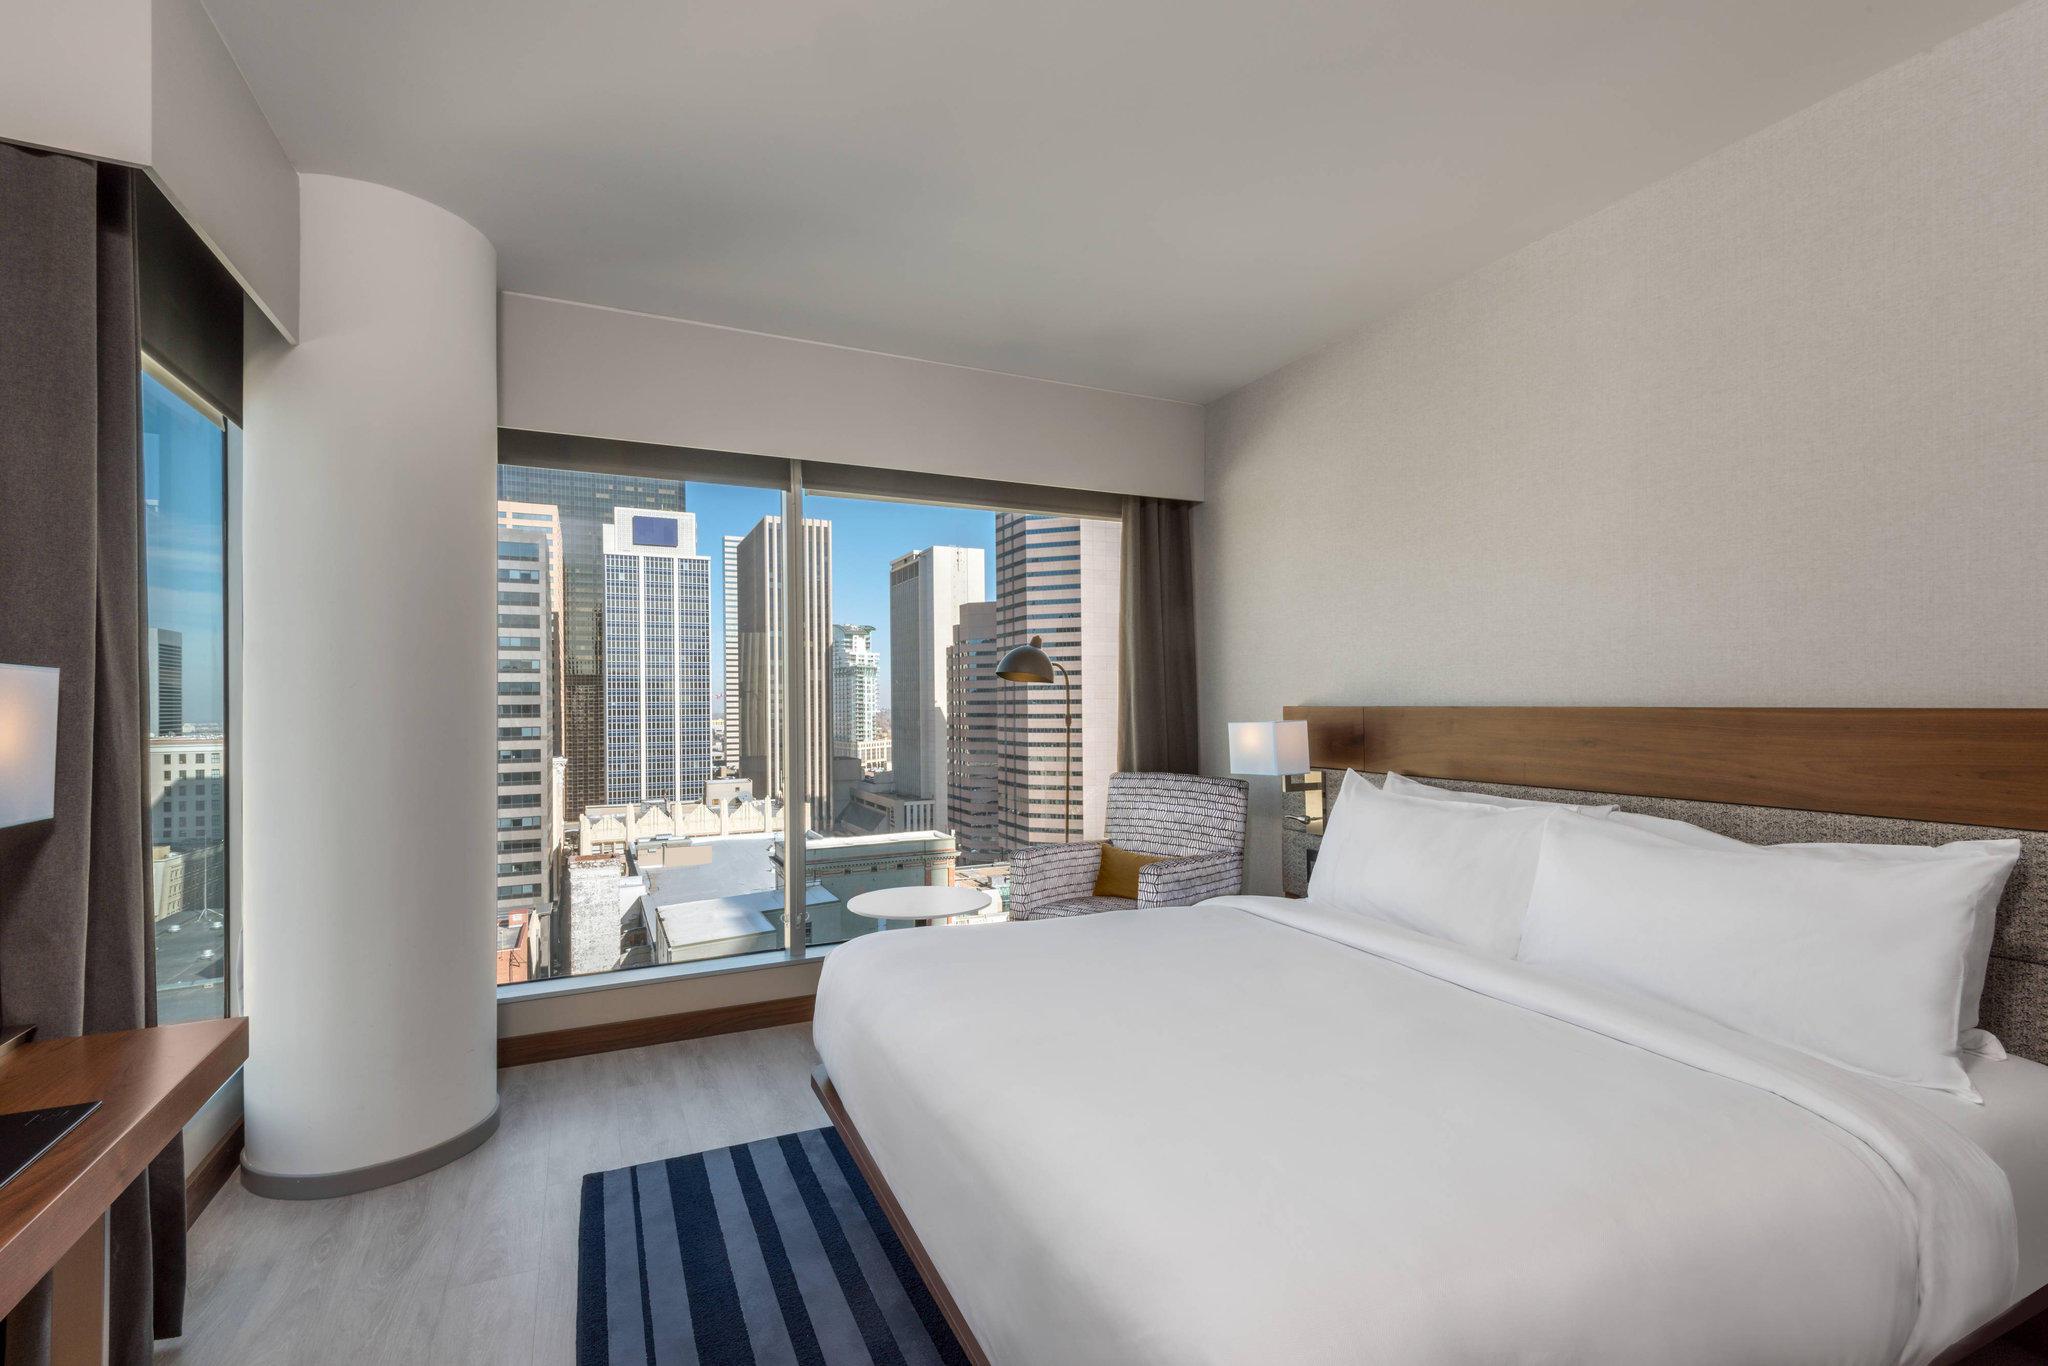 AC Hotel by Marriott Denver Downtown - OPEN